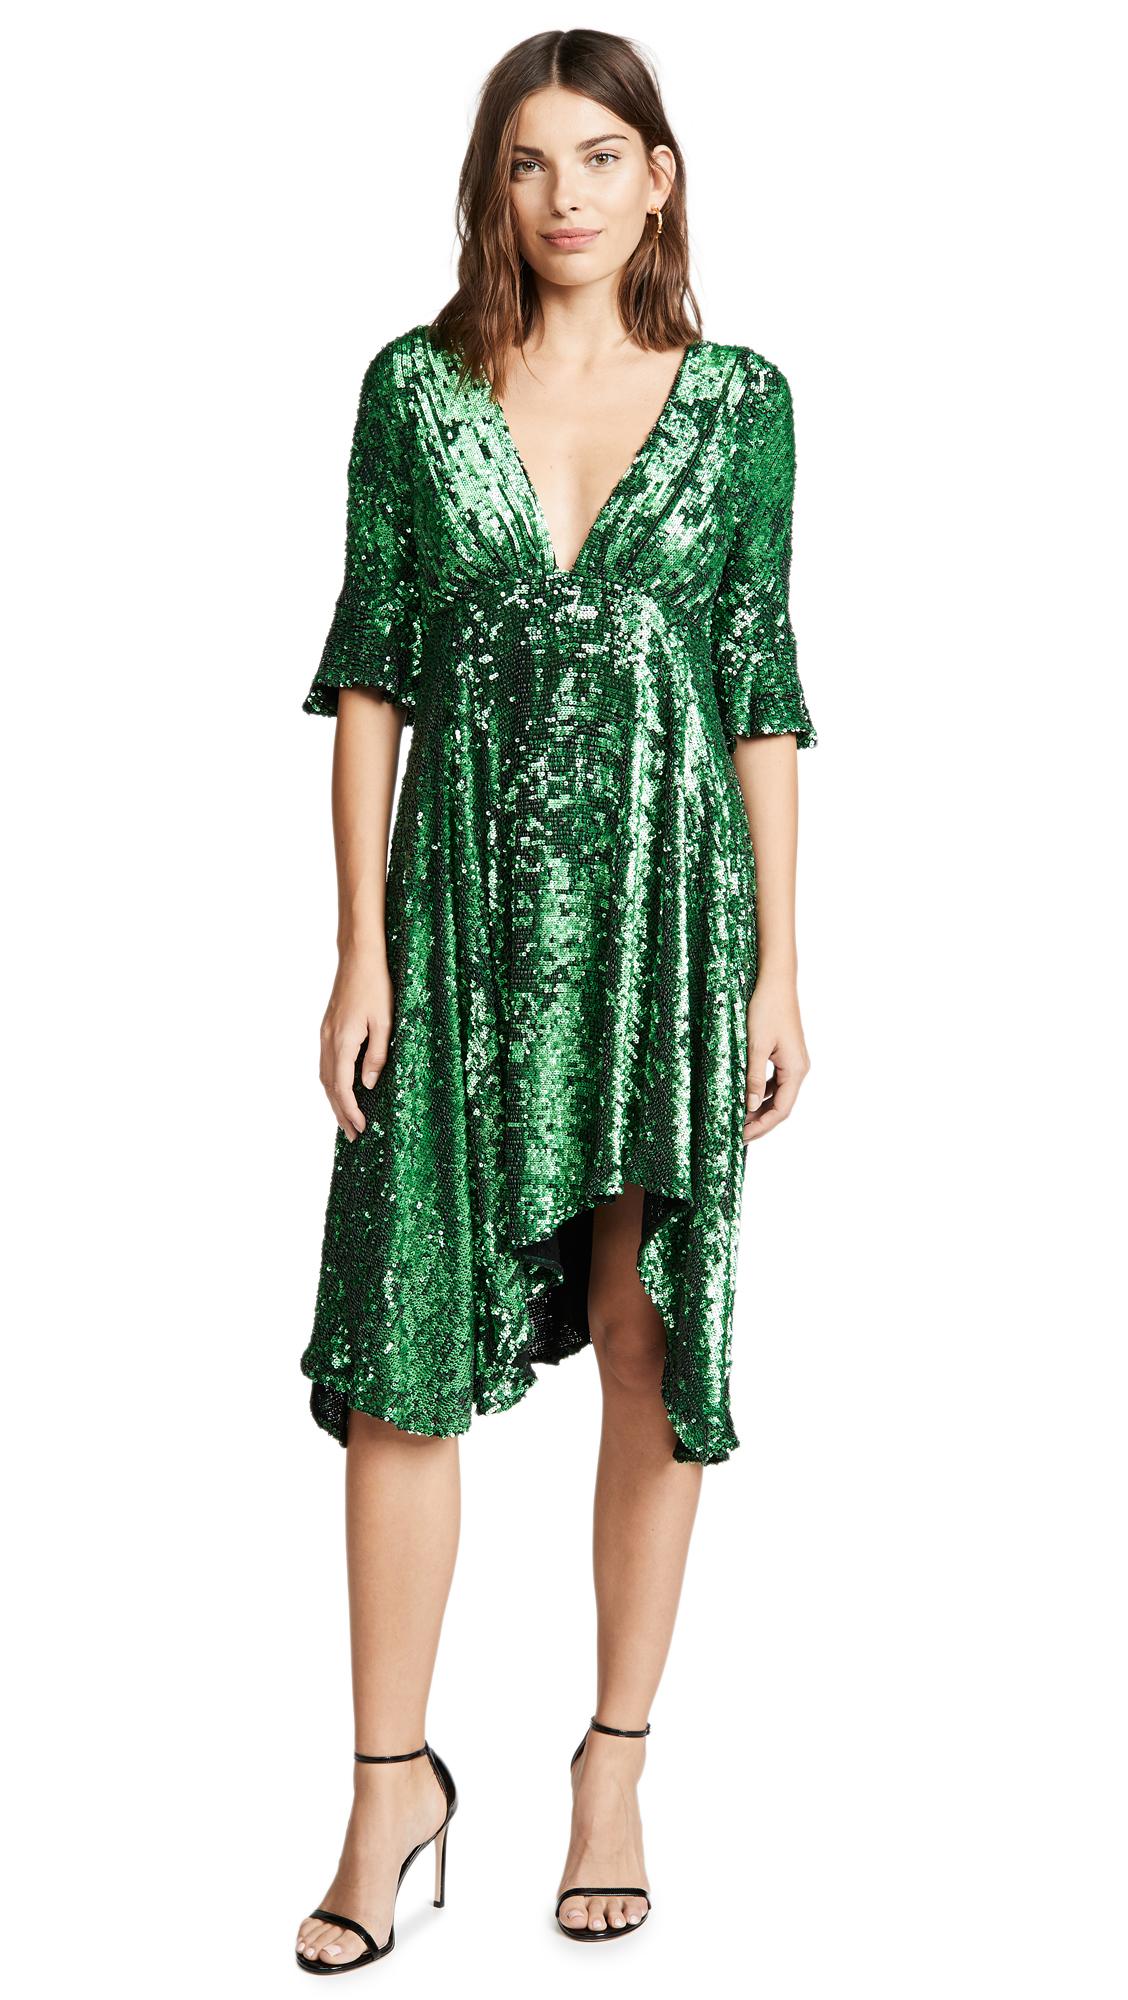 Arielle Dress in Emerald